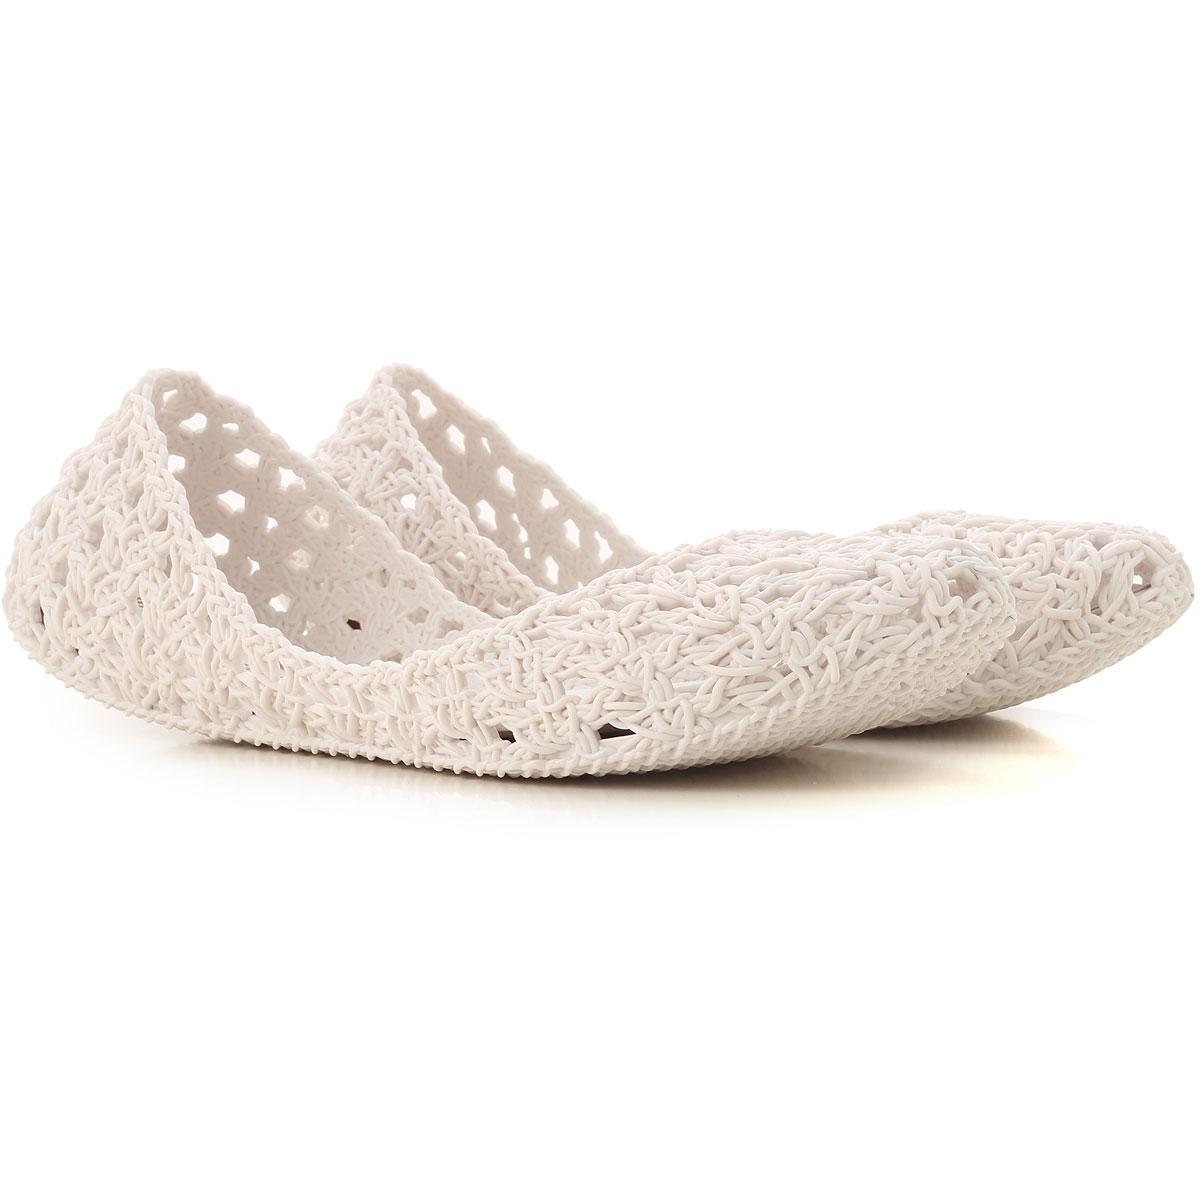 Melissa Ballet Flats Ballerina Shoes for Women On Sale, Melissa / Campana, Optical White, PVC, 2019, 9